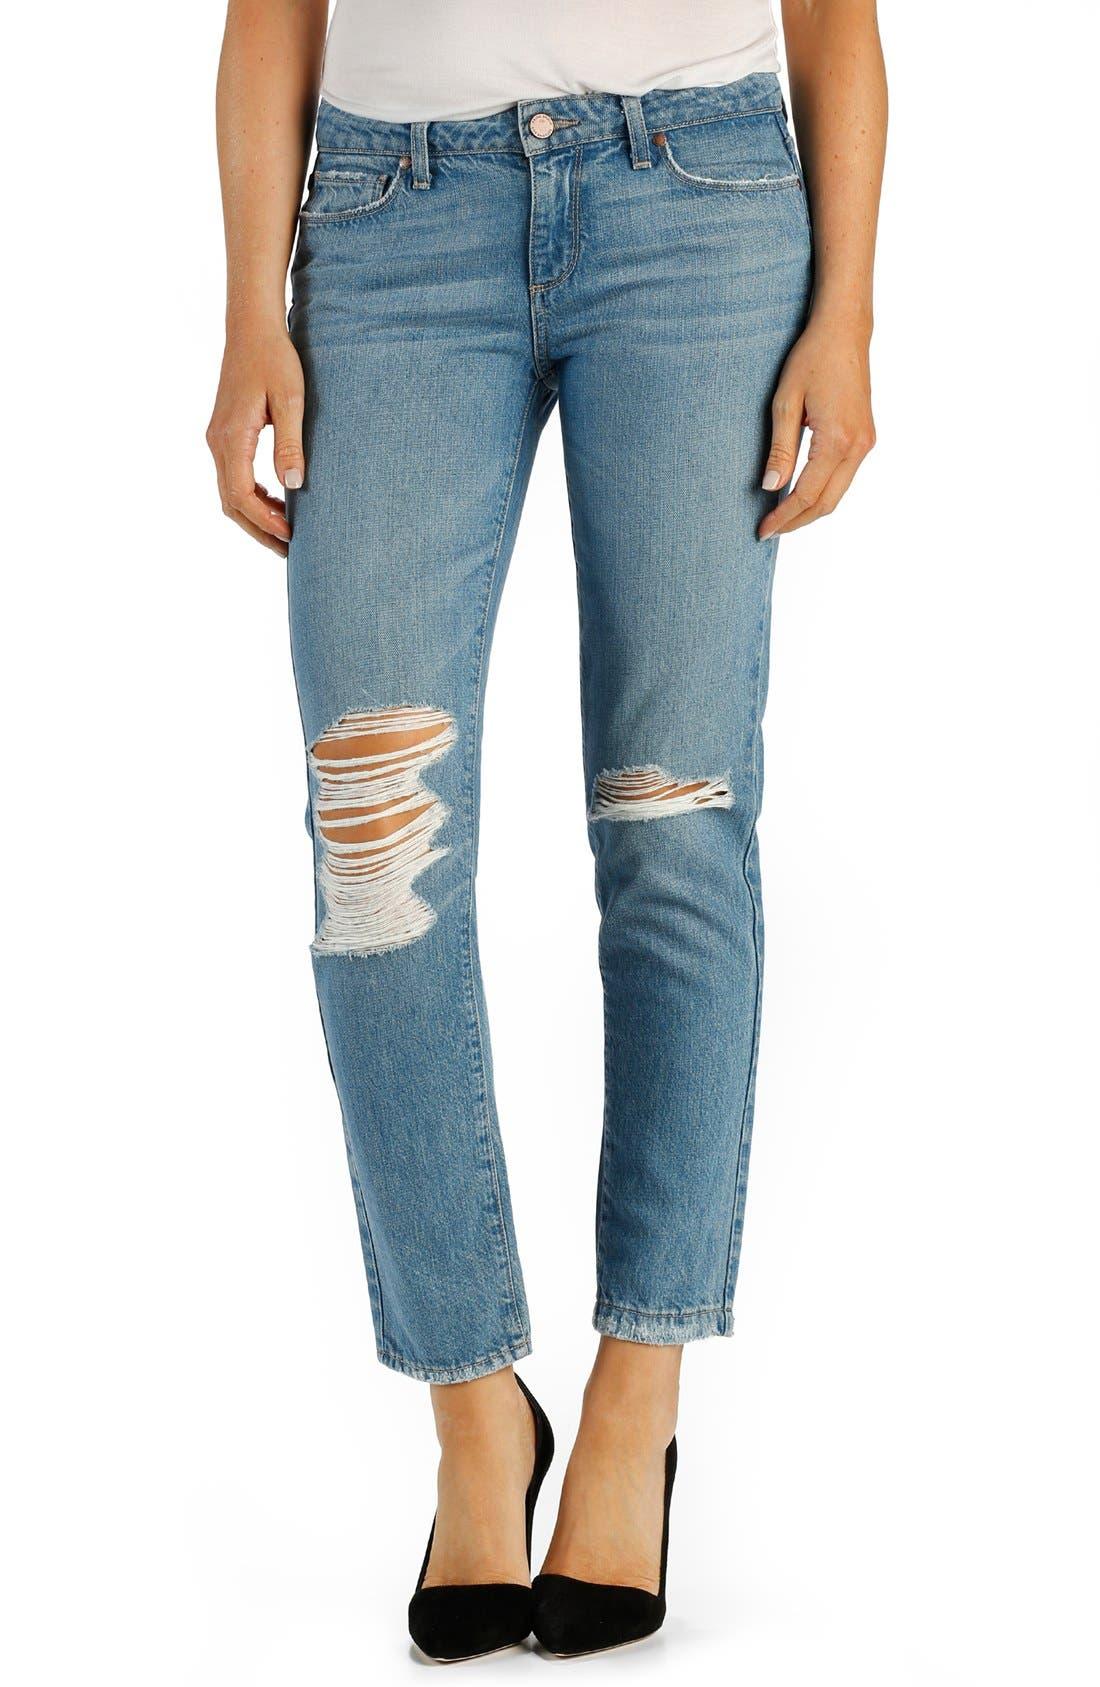 PAIGE Denim 'Jimmy Jimmy' Ankle Boyfriend Skinny Jeans, Main, color, 400